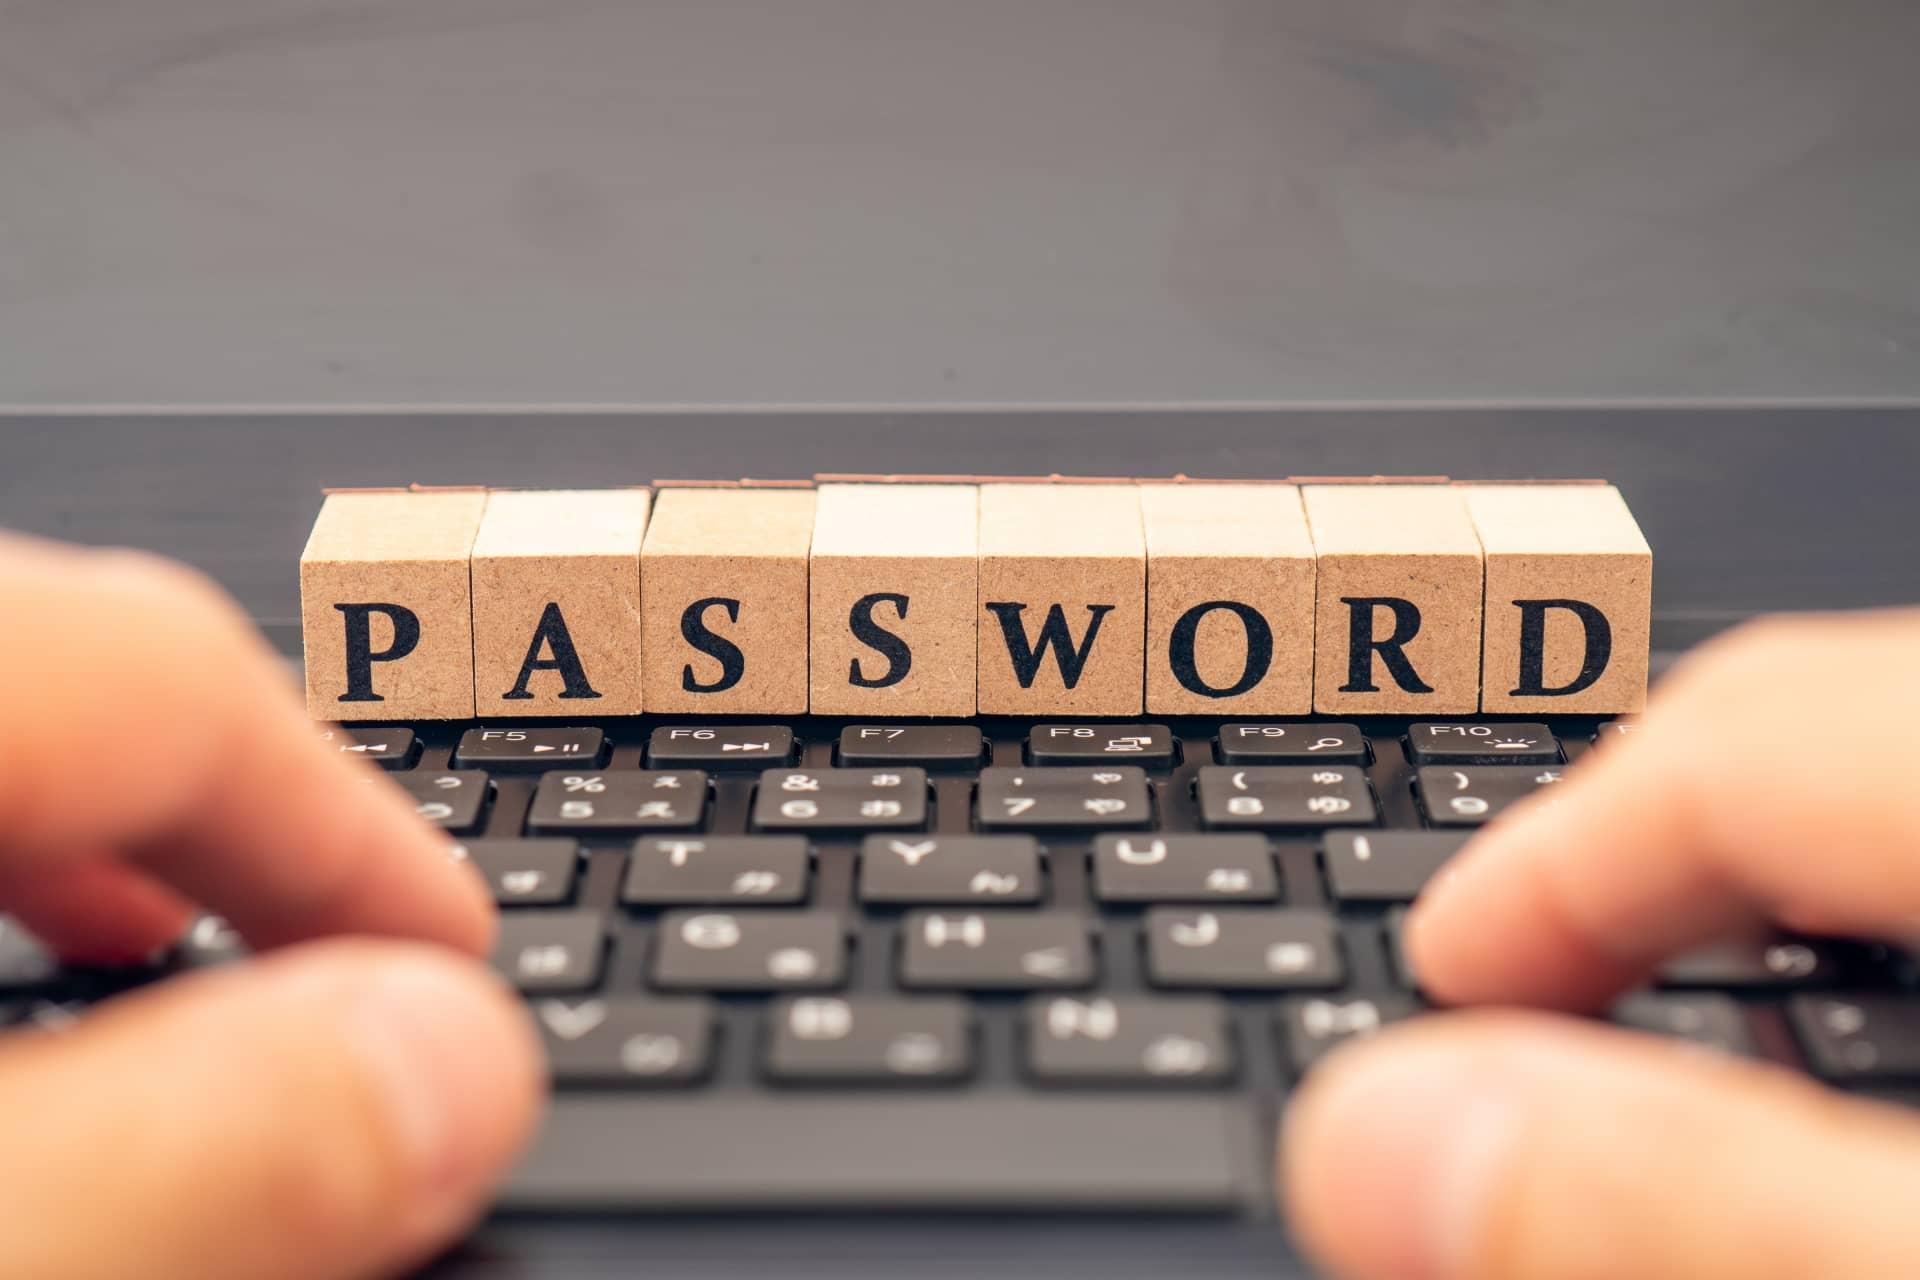 EC-CUBEで管理者のパスワードを紛失した場合の対処法